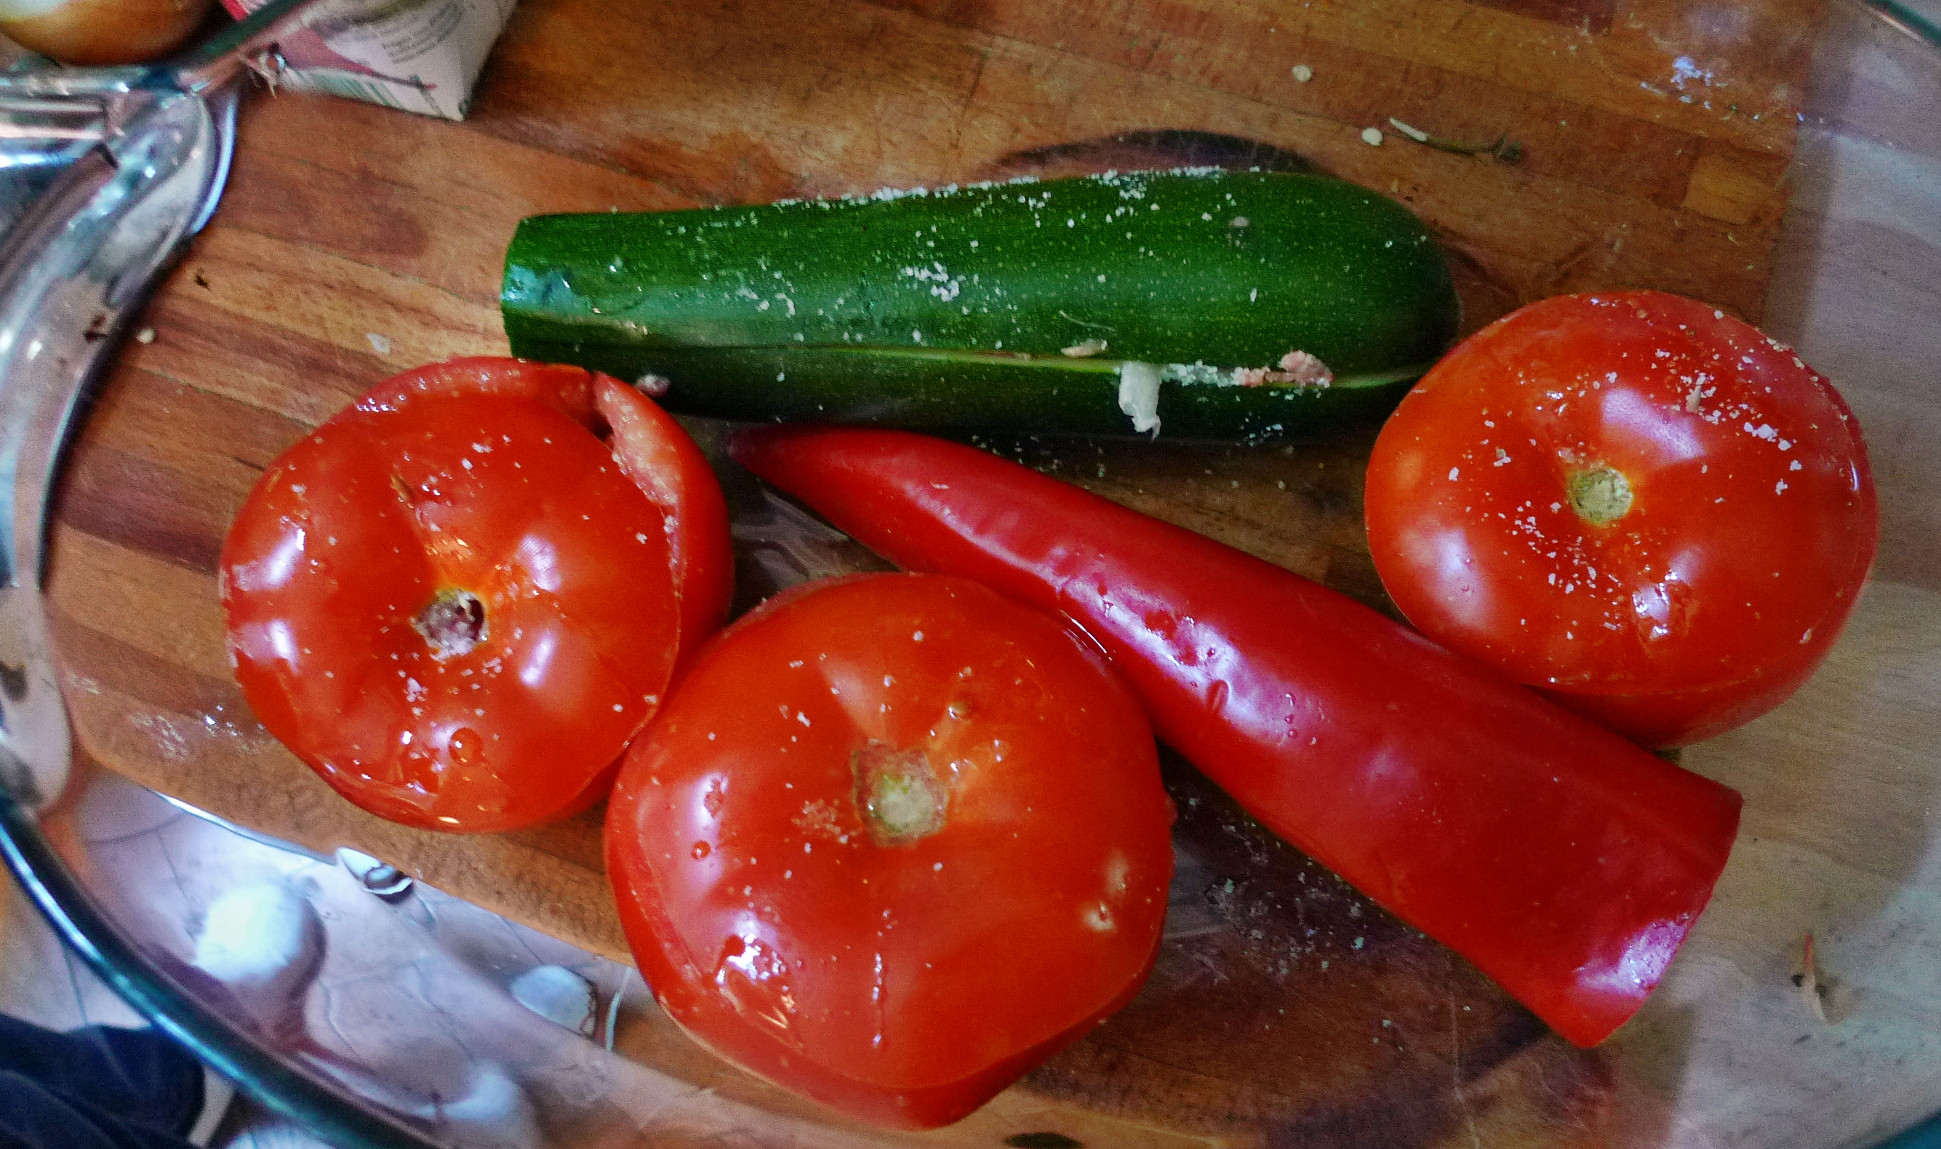 Fefüllte Tomaten,Couscous - 22.5.15   (6)